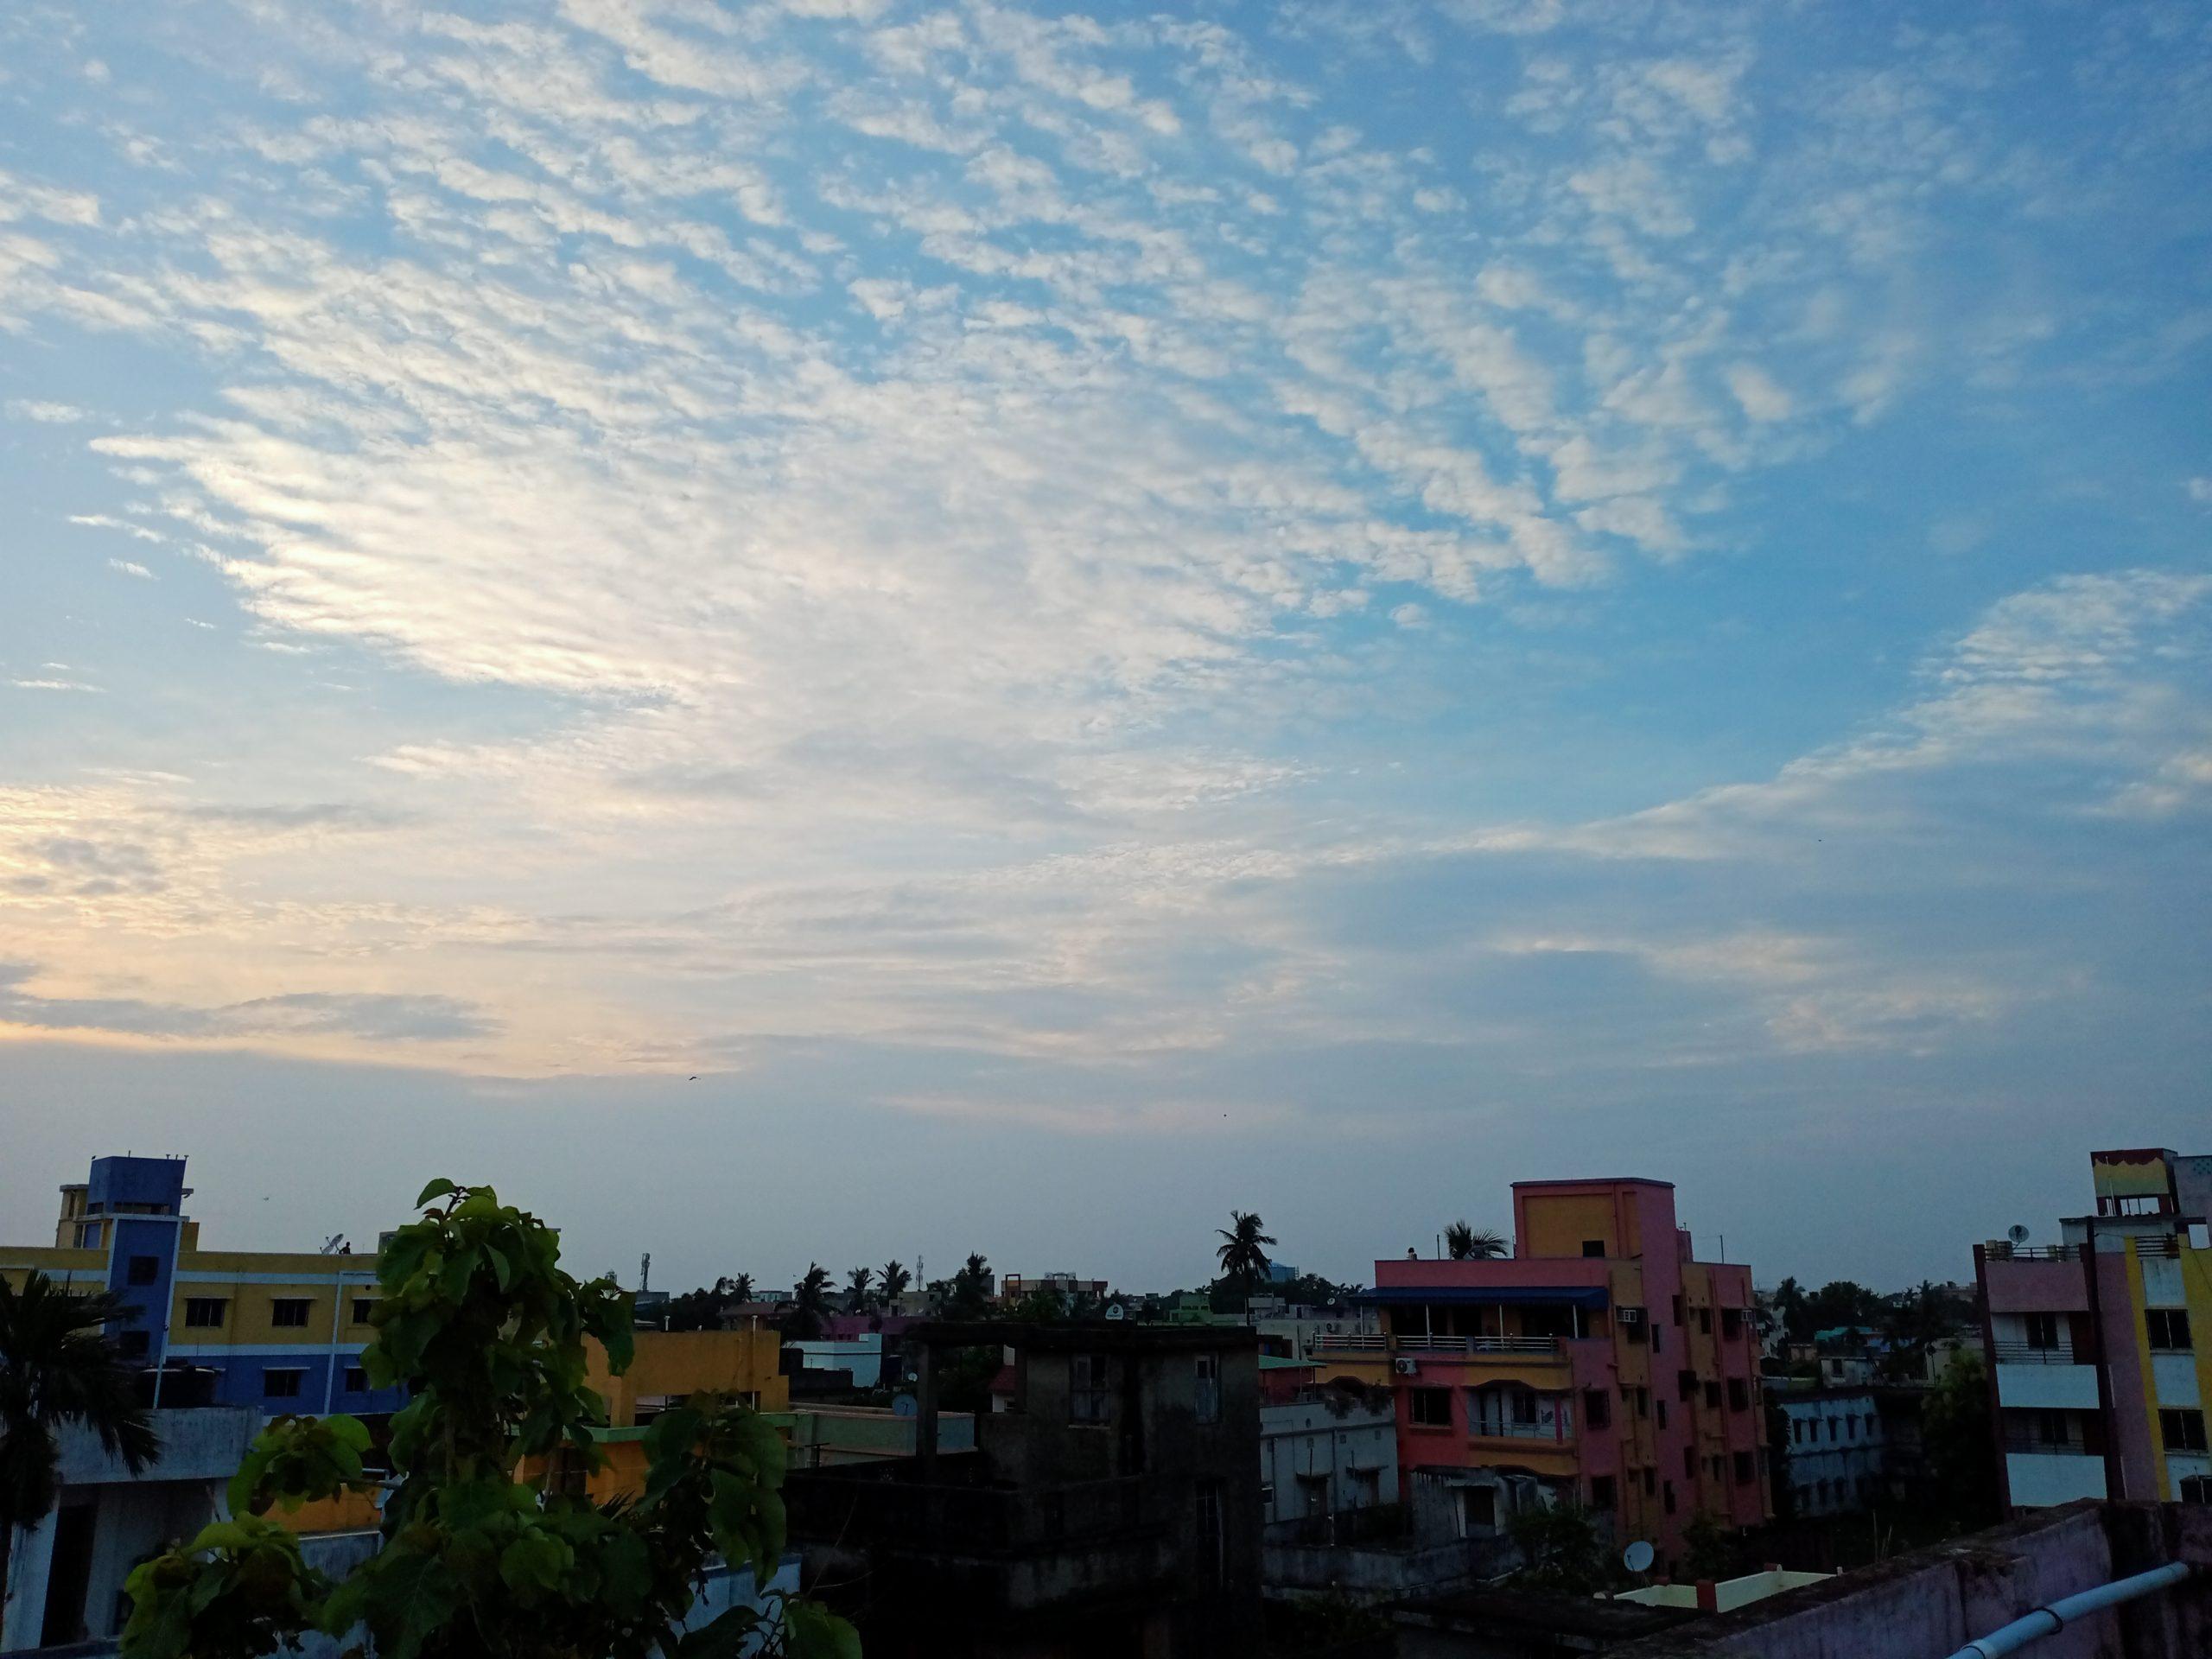 Buildings under the open sky